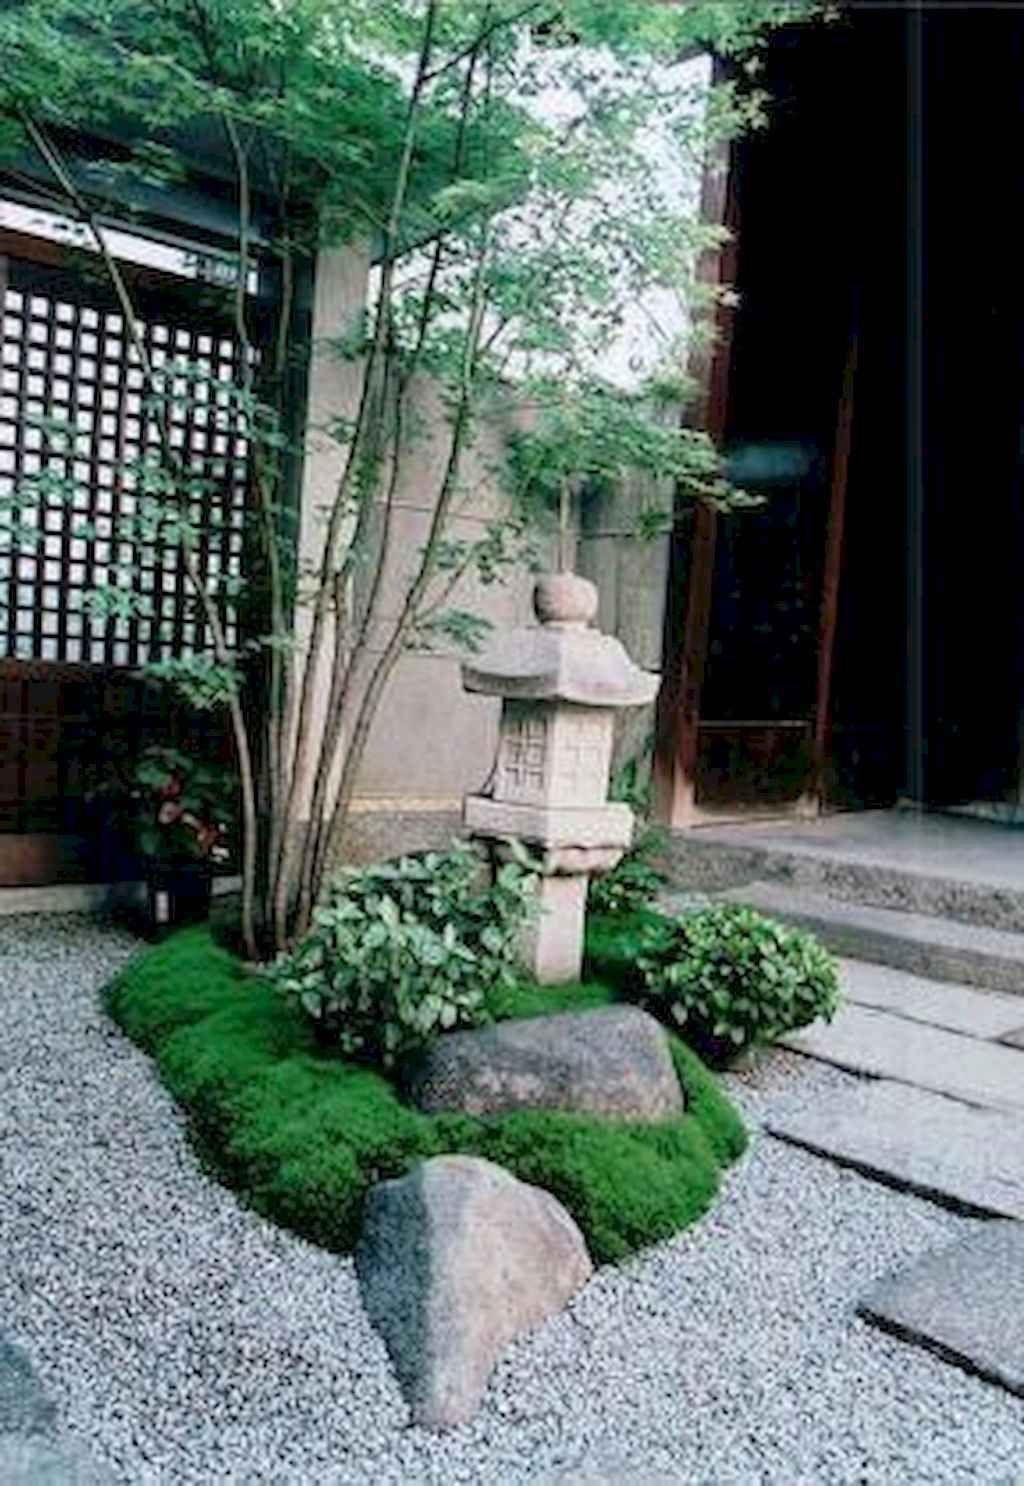 Inspiring Japanese Garden Designs For Small Spaces 43 400 x 300